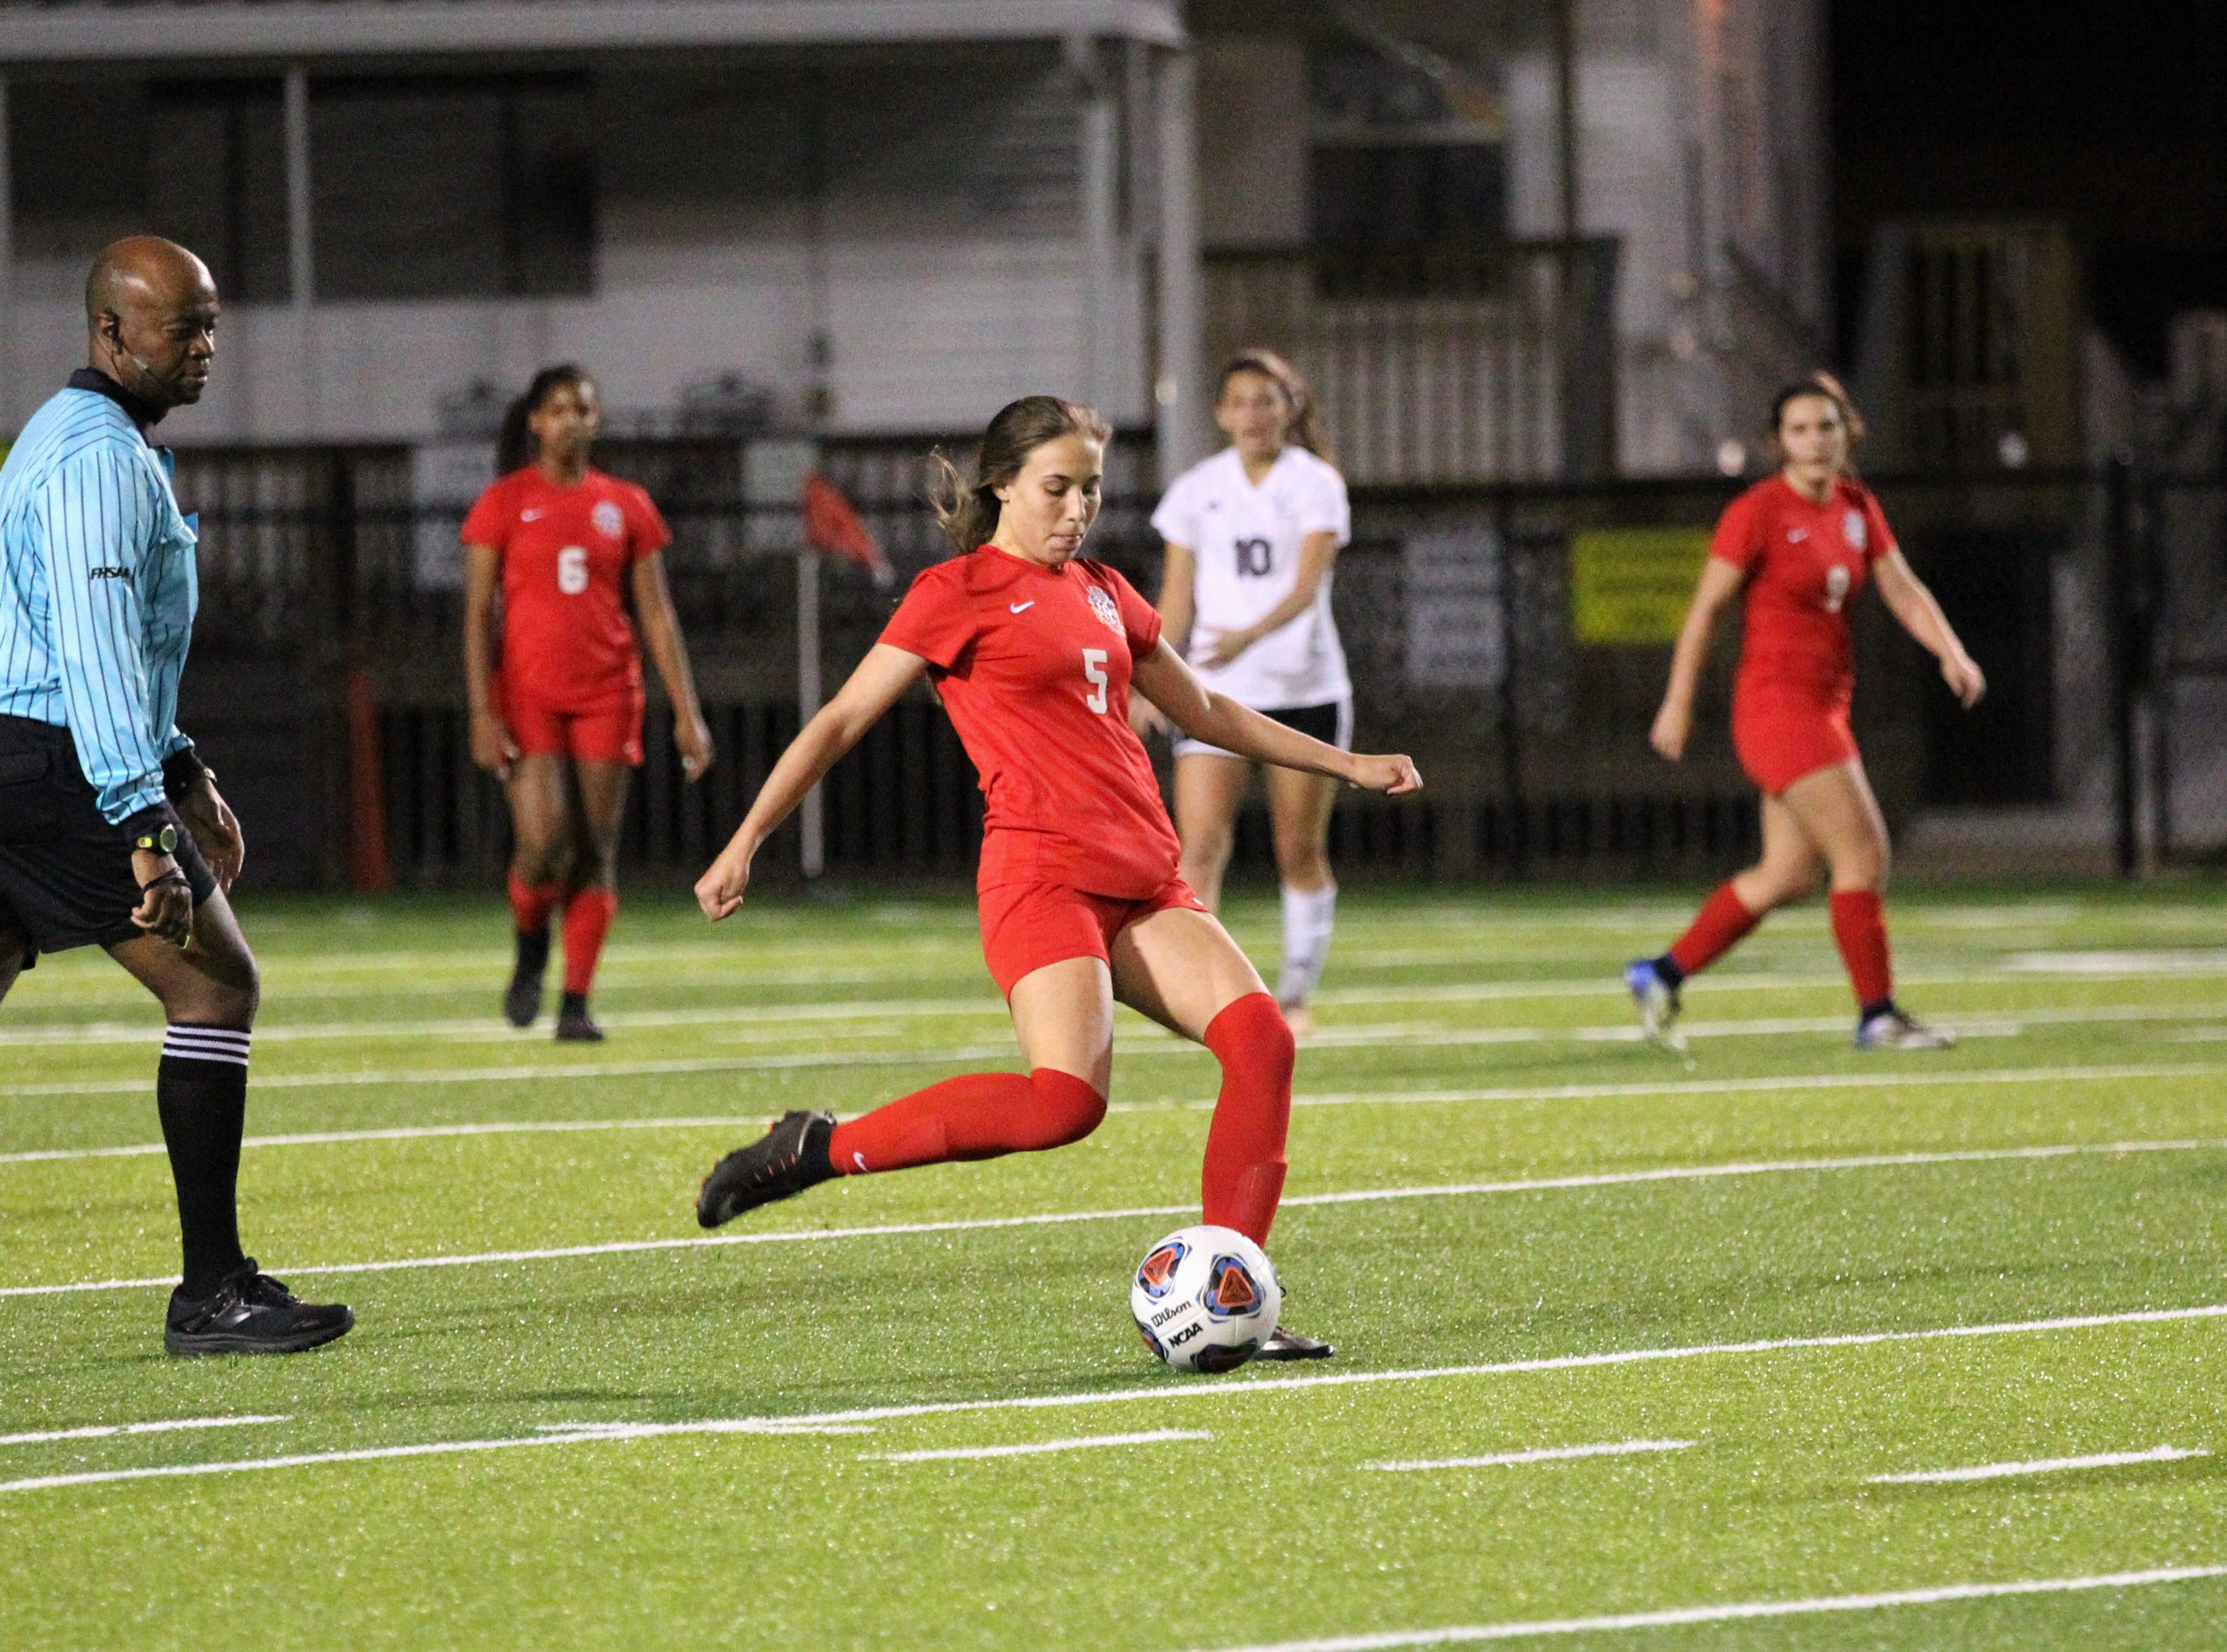 Leon's Allie Krikorian sends a pass upfield as Niceville's girls soccer team beat Leon 1-0 in a Region 1-4A semifinal at Gene Cox Stadium on Jan. 8, 2019.